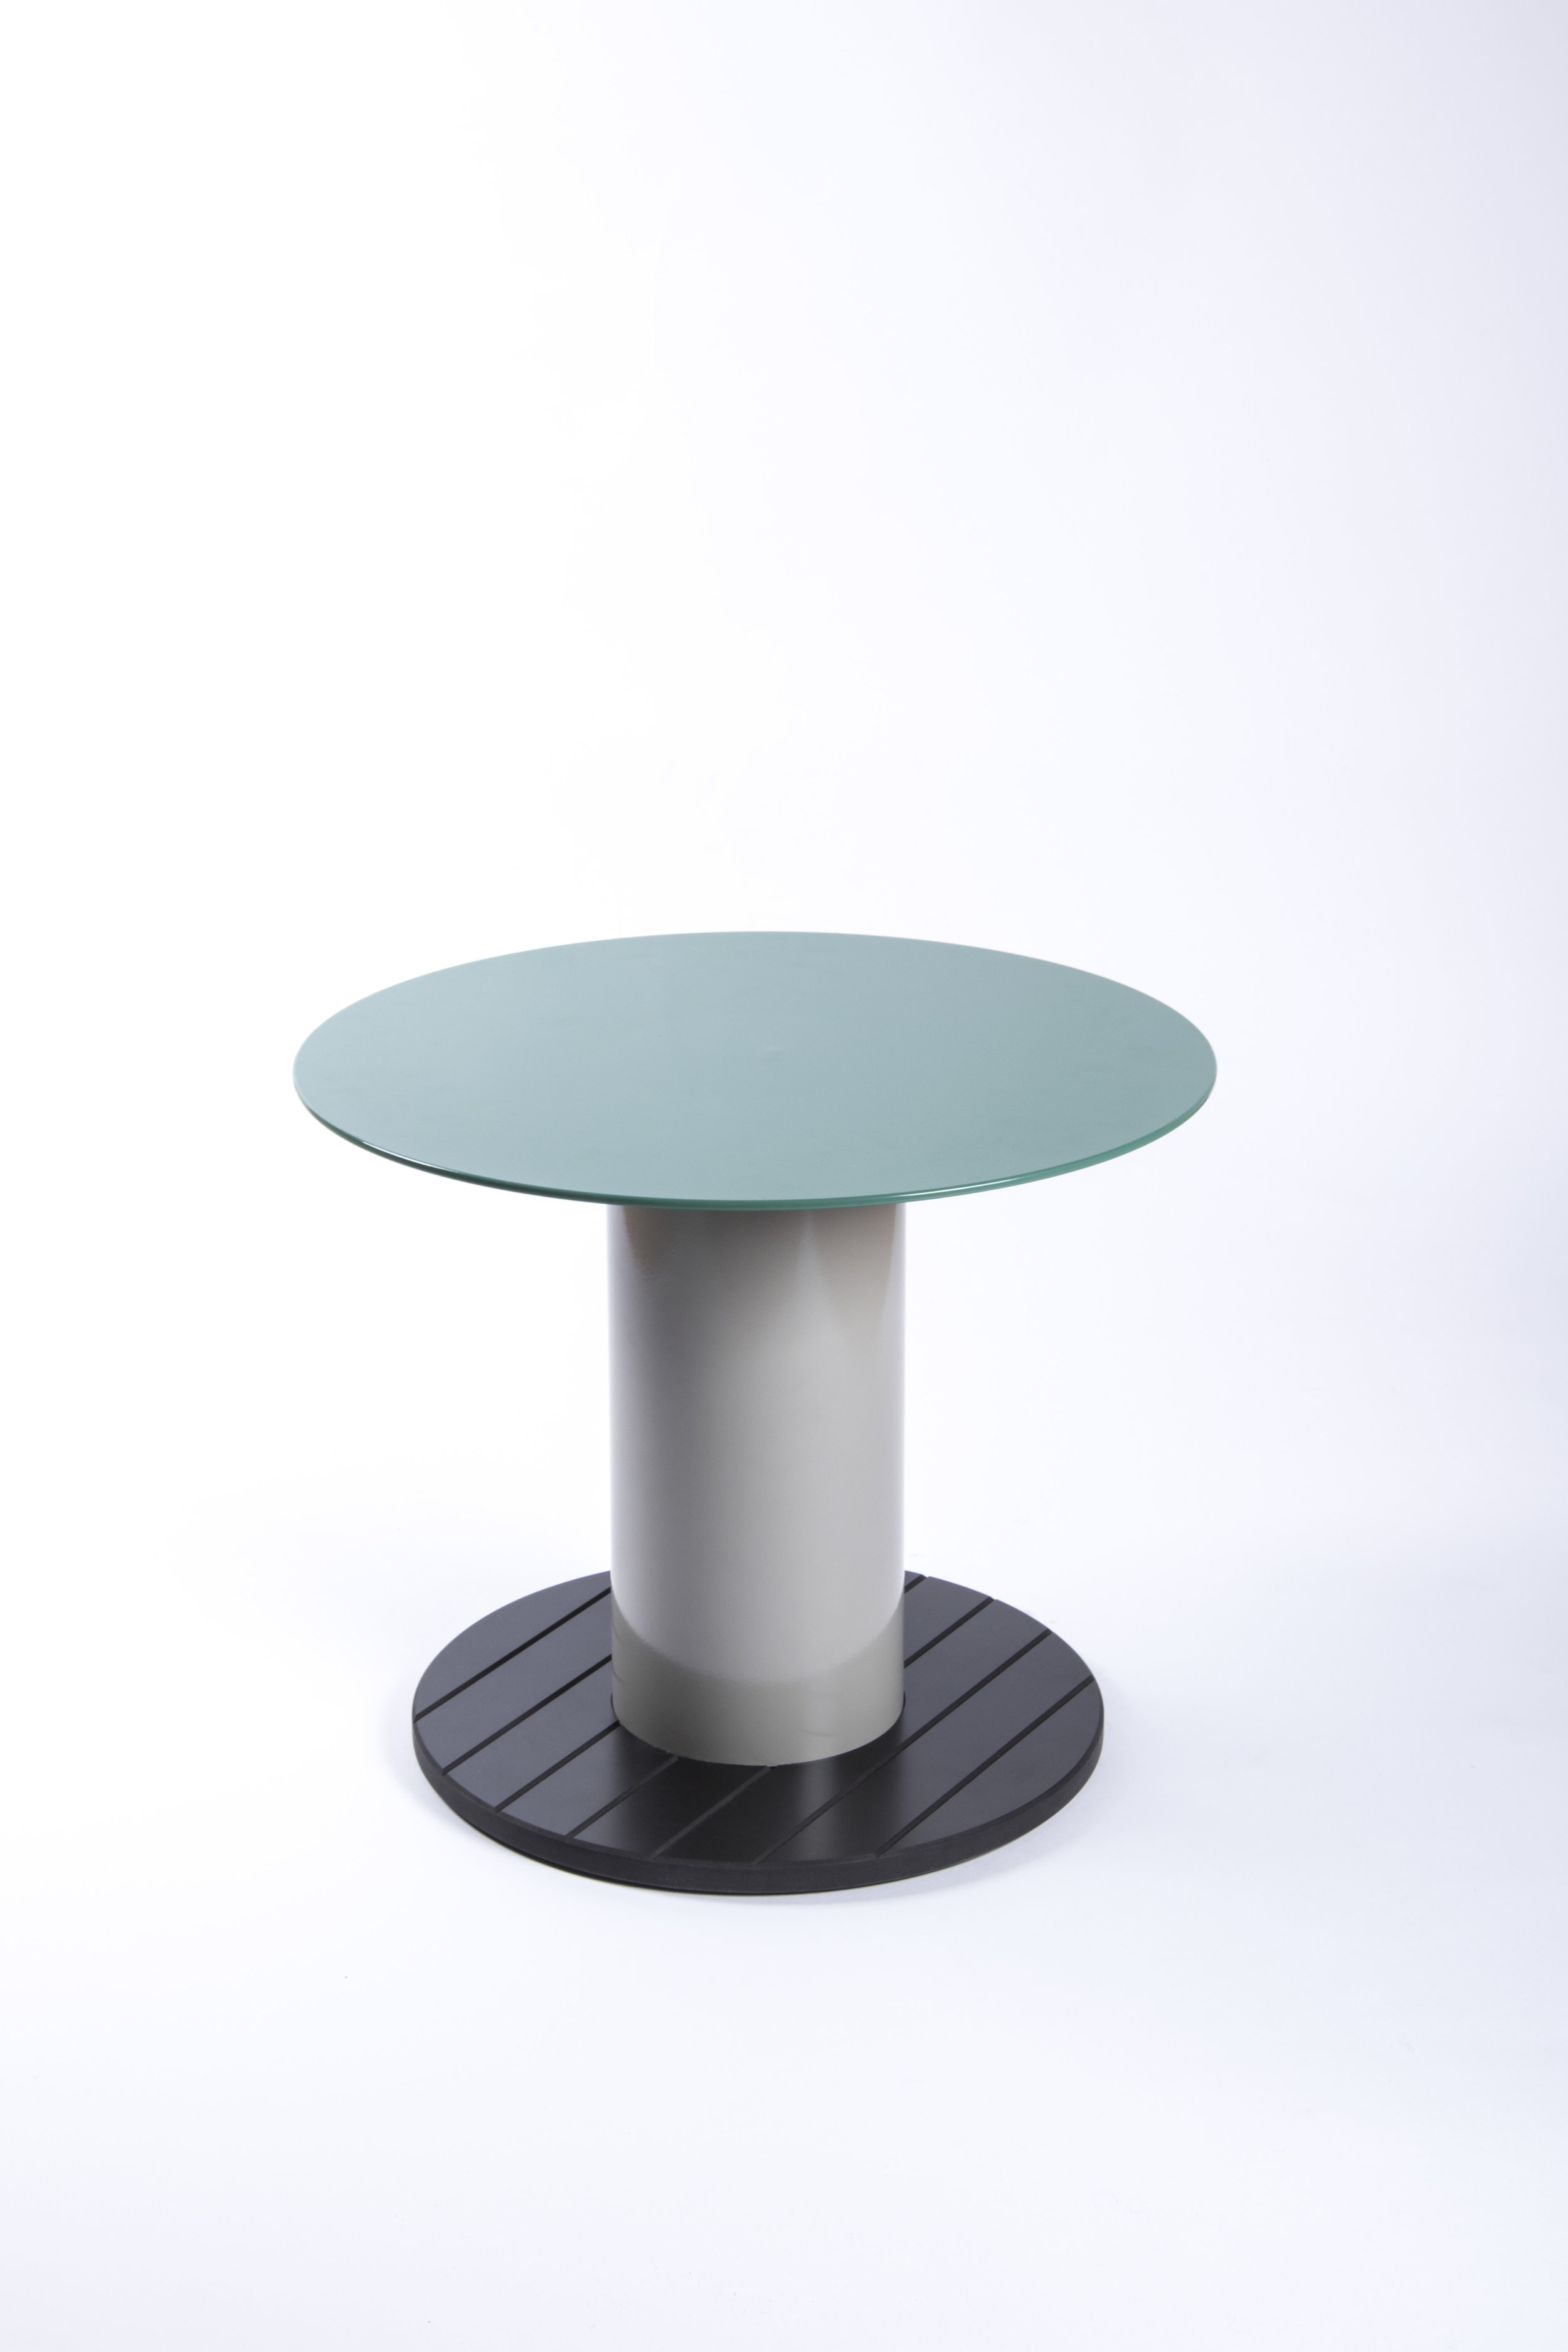 Reel Side Tables - David Derksen Design03.jpg